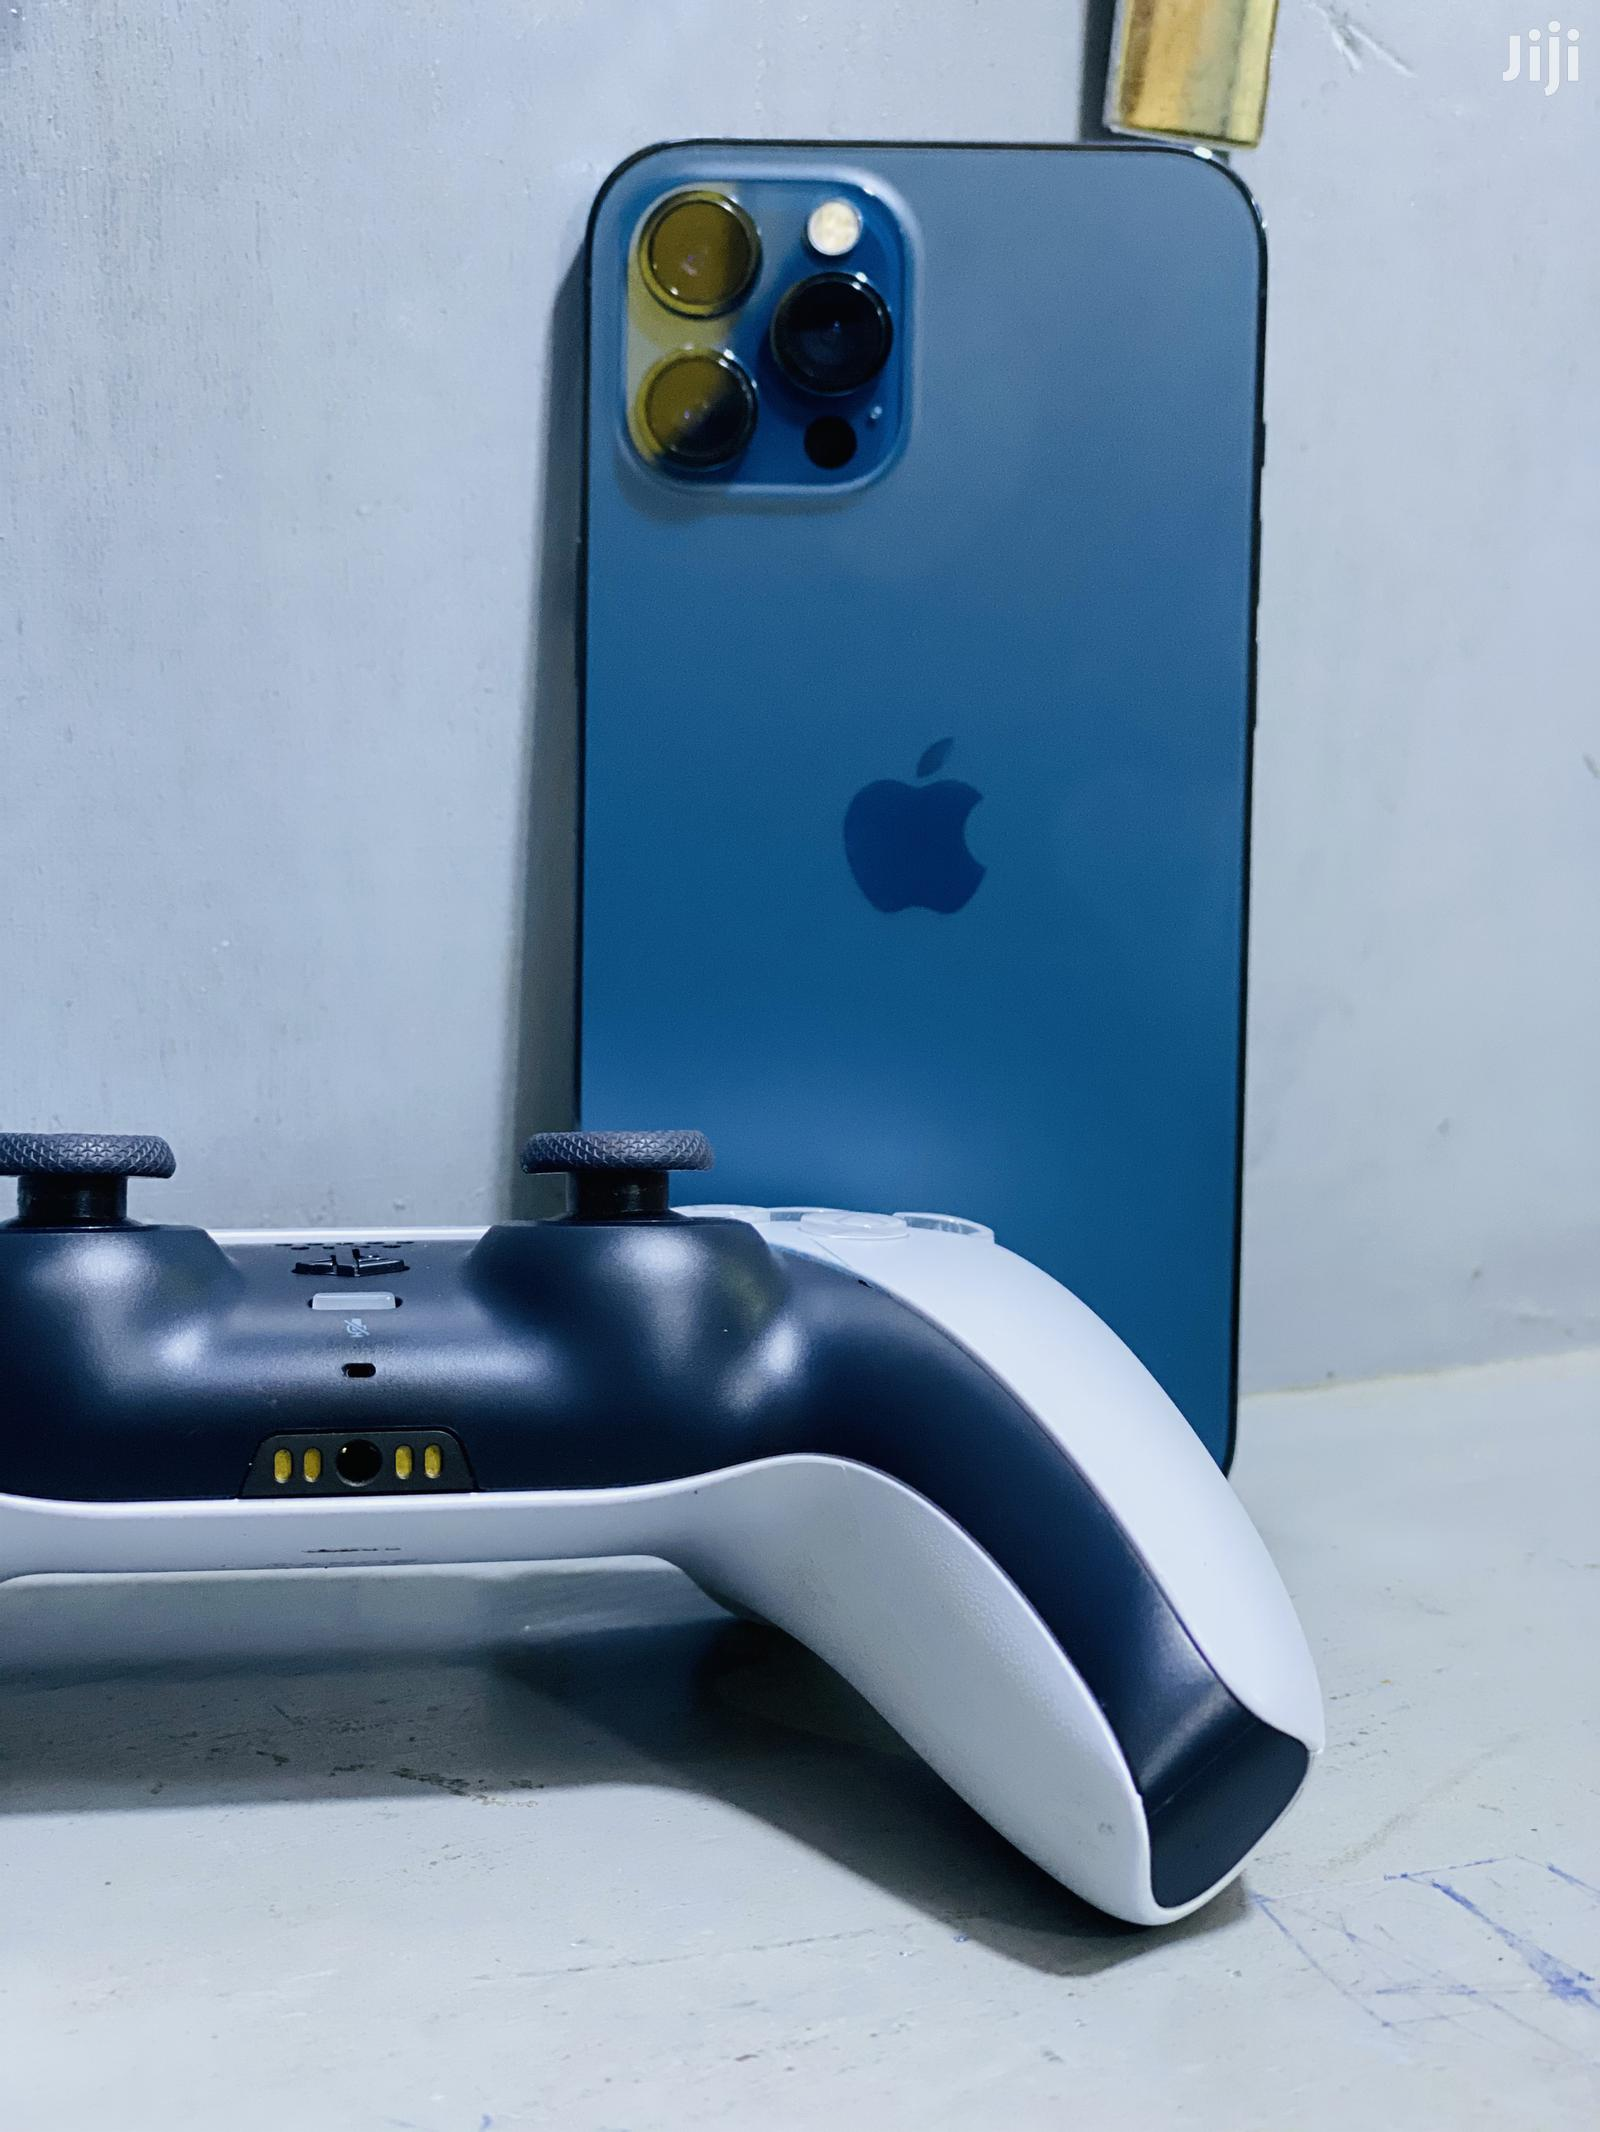 Apple iPhone 12 Pro Max 128GB Blue | Mobile Phones for sale in Ilala, Dar es Salaam, Tanzania